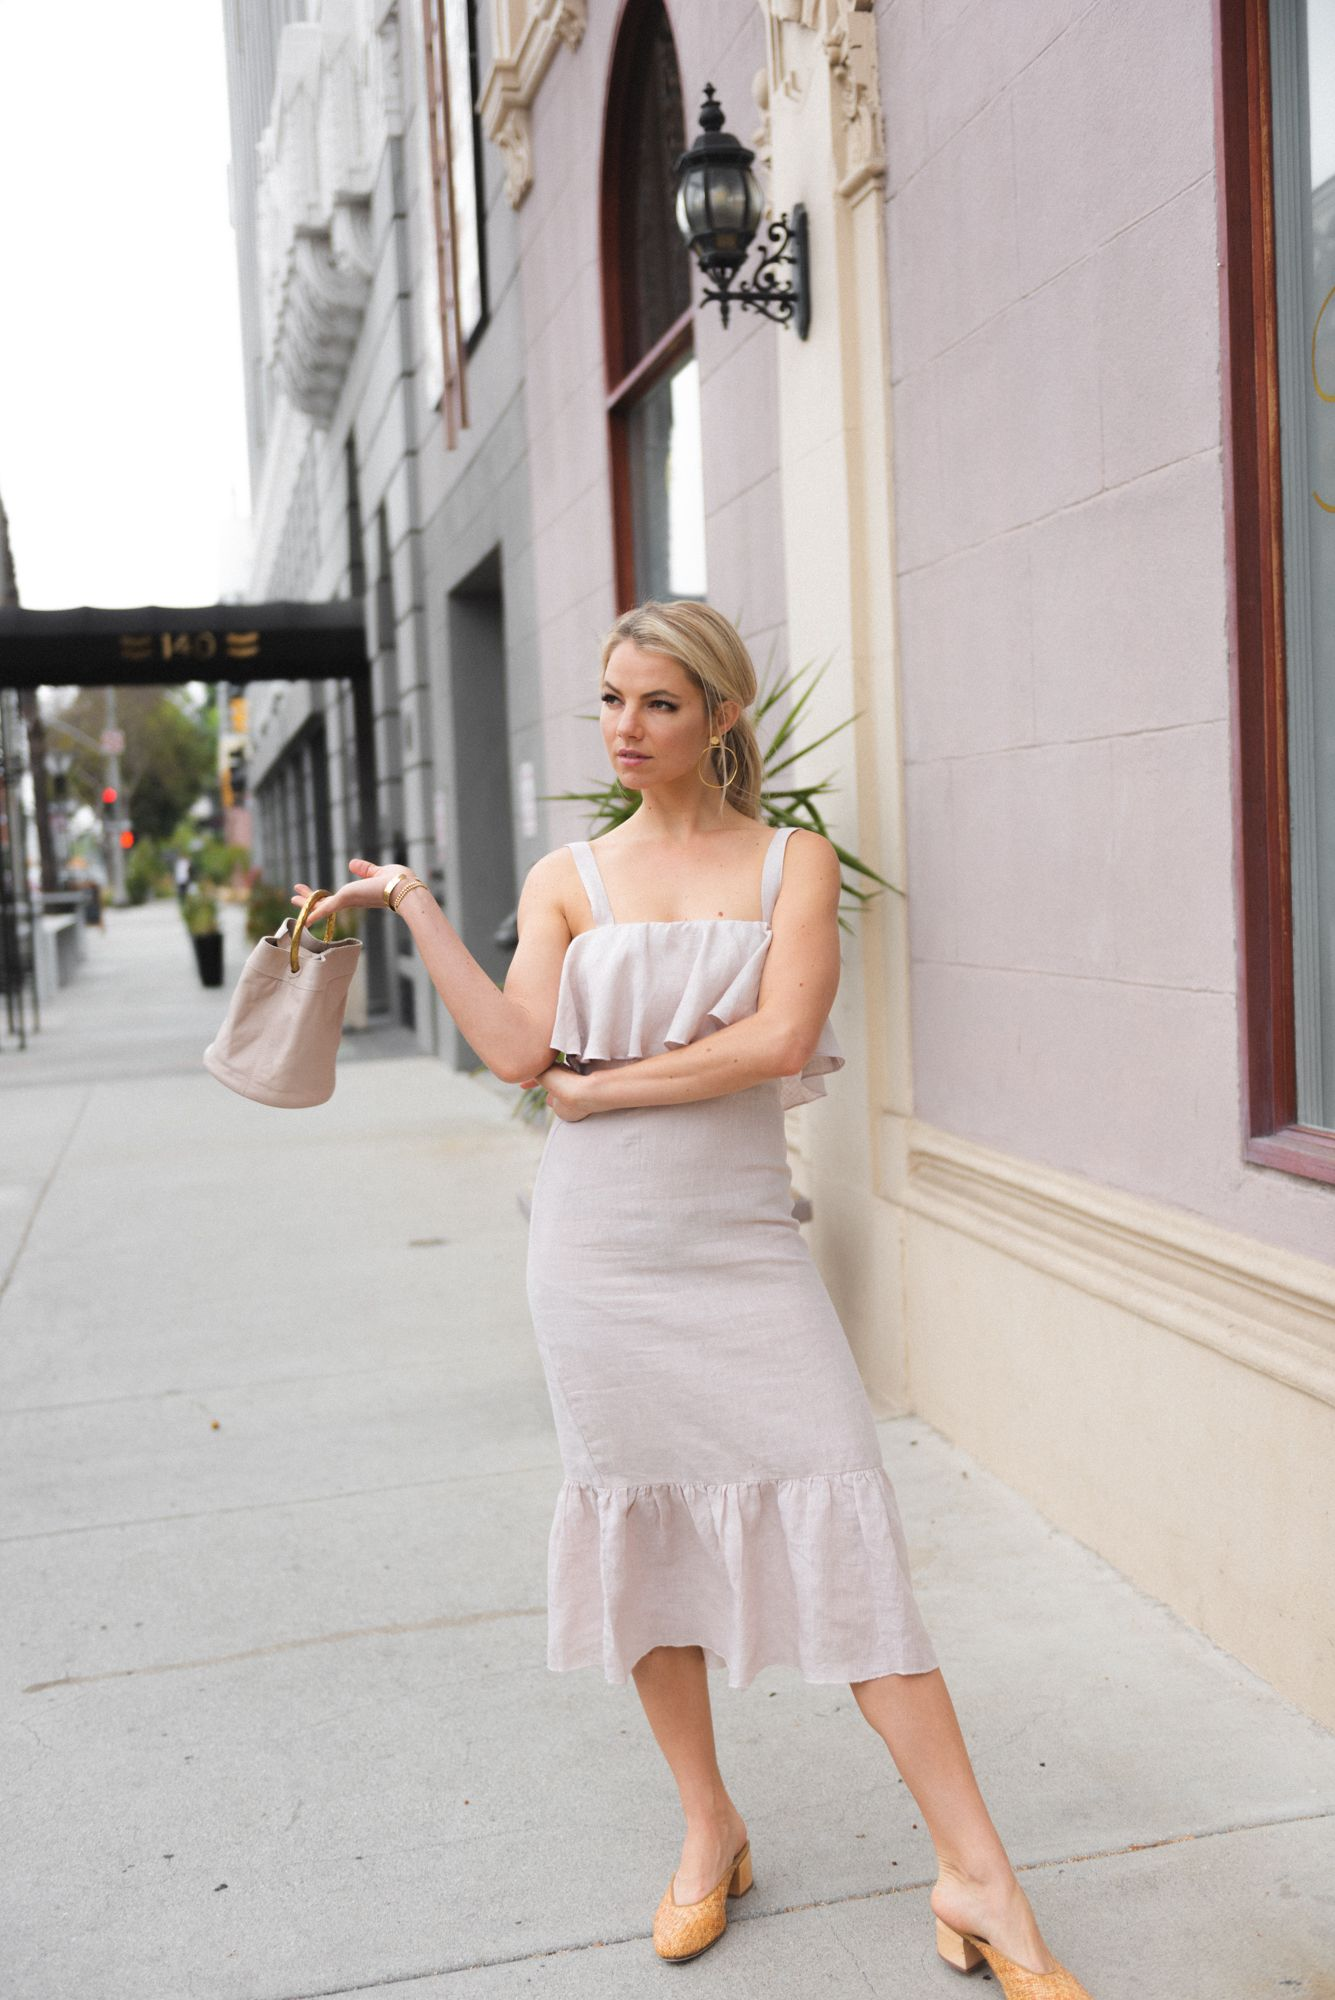 2d0506eab8a Winston White Lavender Linen Ruffle Midi Dress Ivory Cleobella Bucket Bag  Woven Mules James Smith Midi Dress Brides Maid Dress Gold Accessories Block  Heel ...